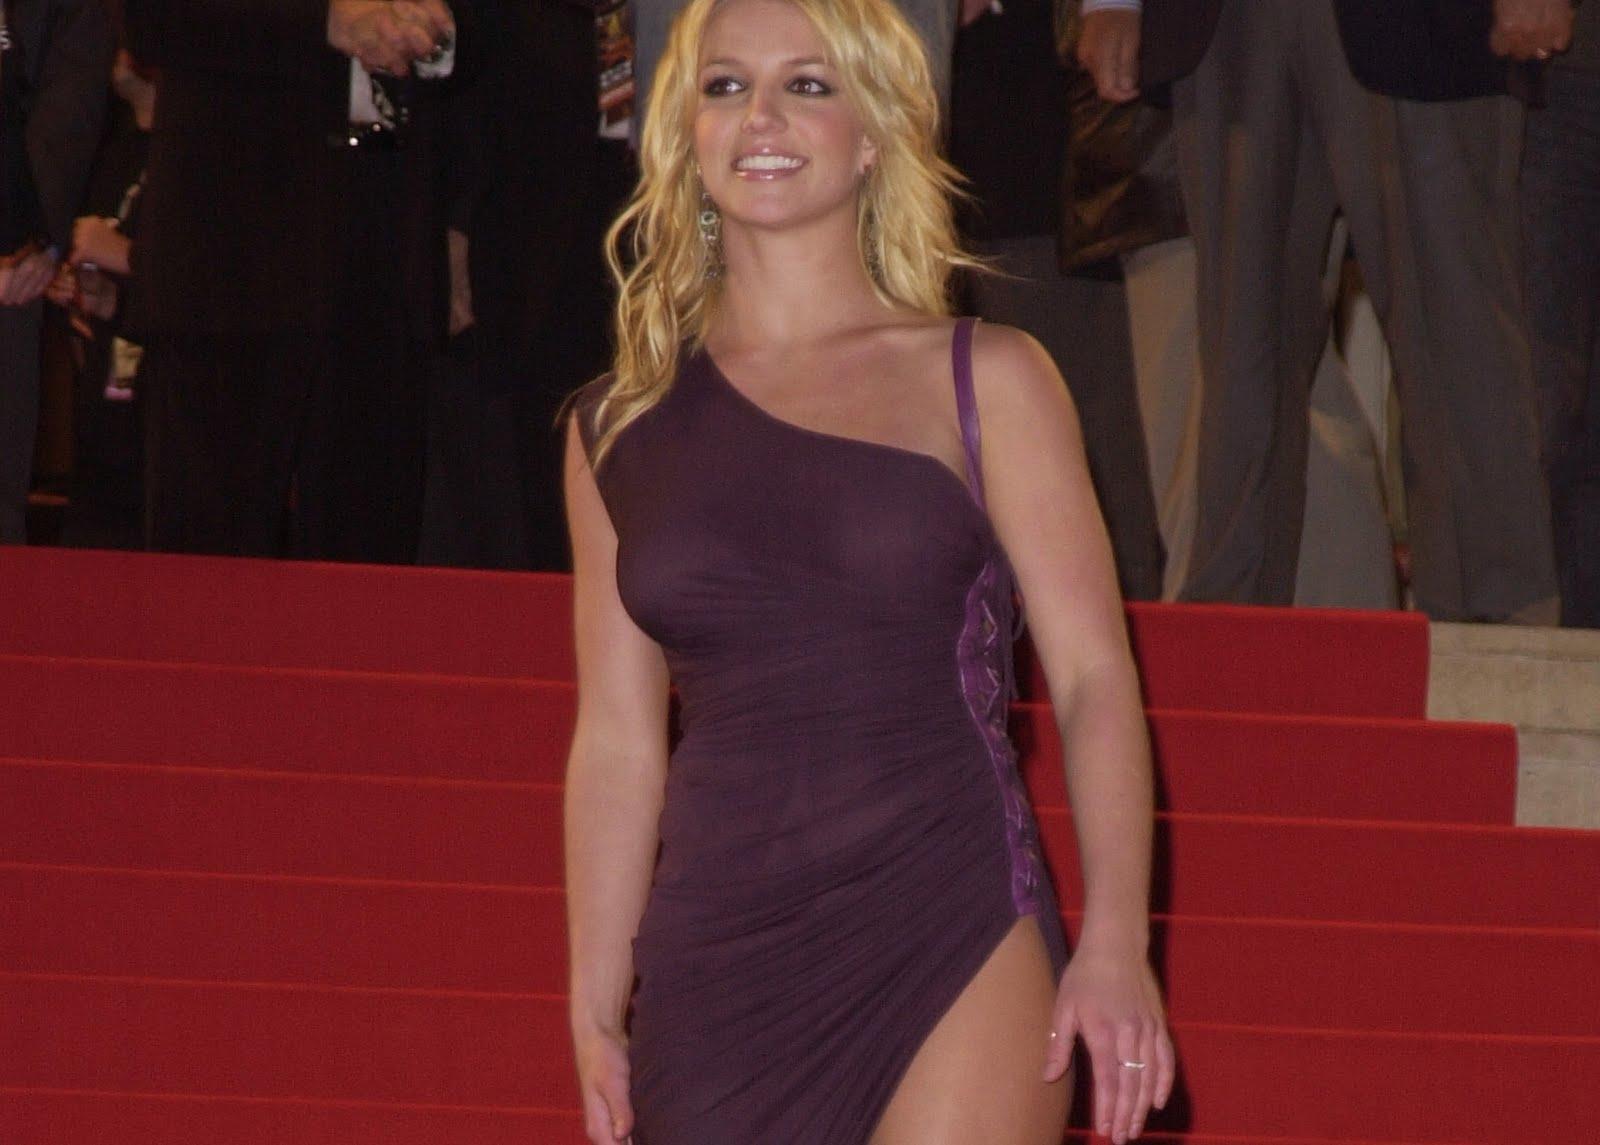 Free Celebrity Photos: Britney Spears Legs (HQ Photos)